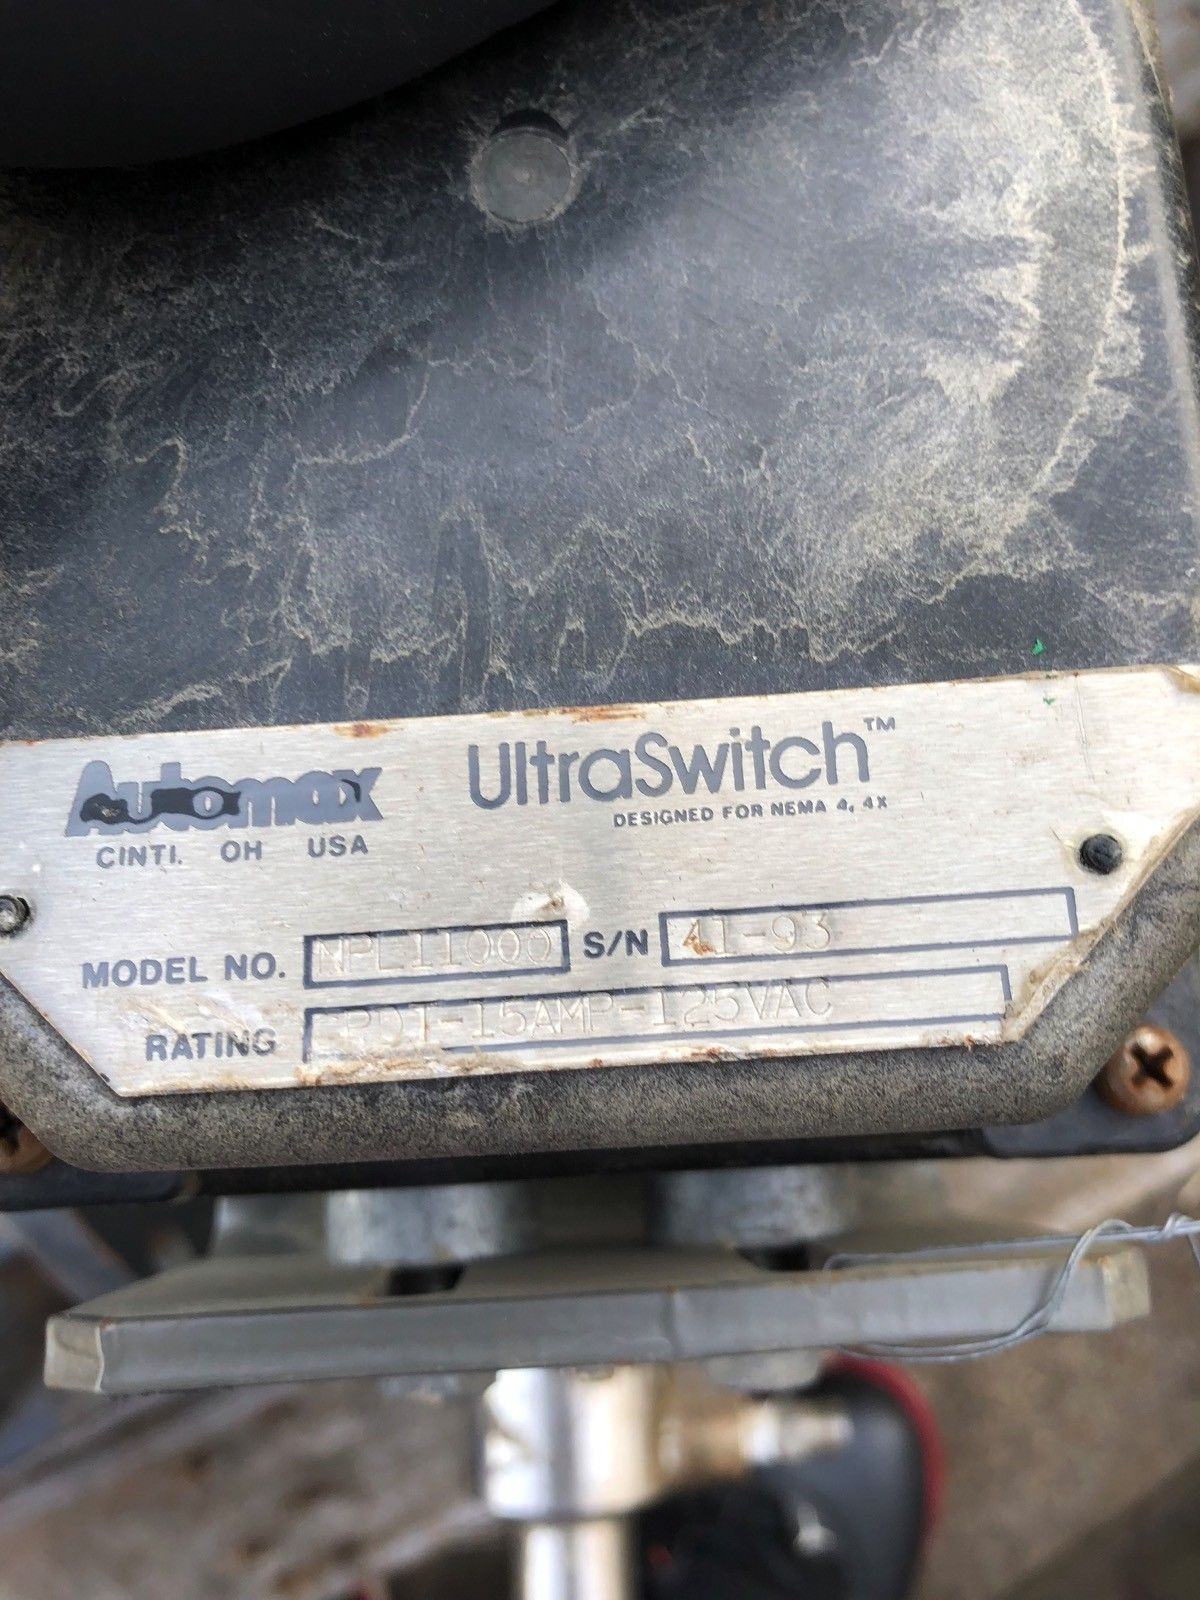 USED AUTOMAX ULTRASWITCH NPLII000 ACTUATOR SCBSP110C NELES JAMESBURY VALVE PTFE 2